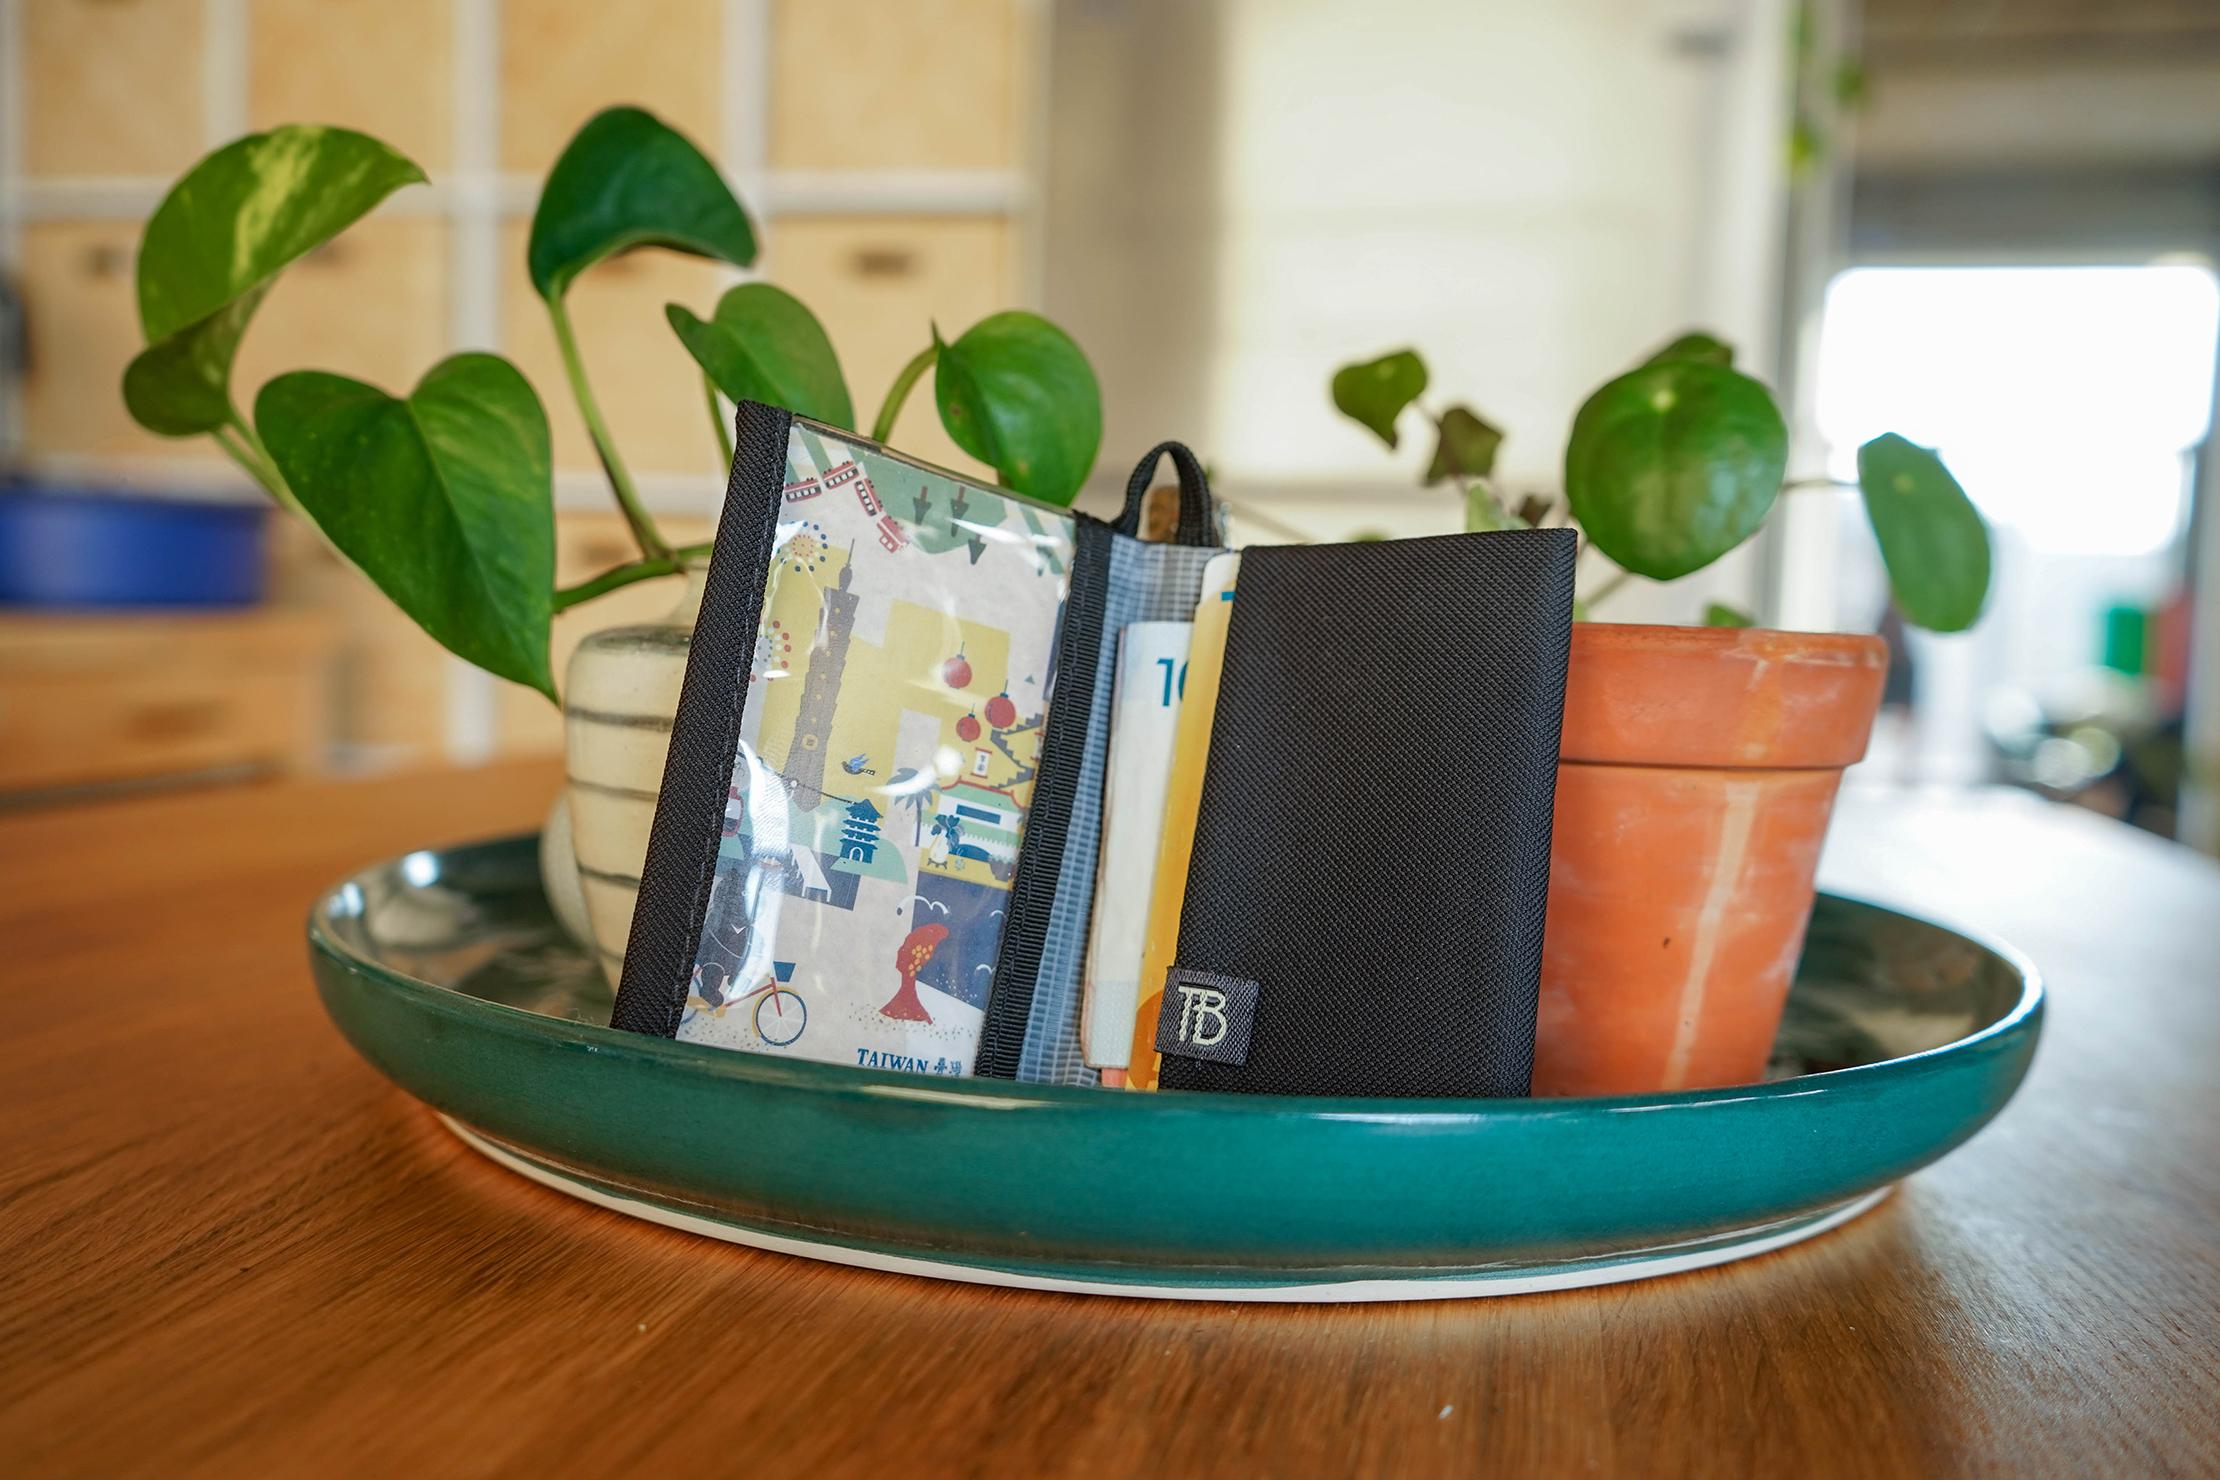 Tom Bihn Nik's Minimalist Wallet In Detroit